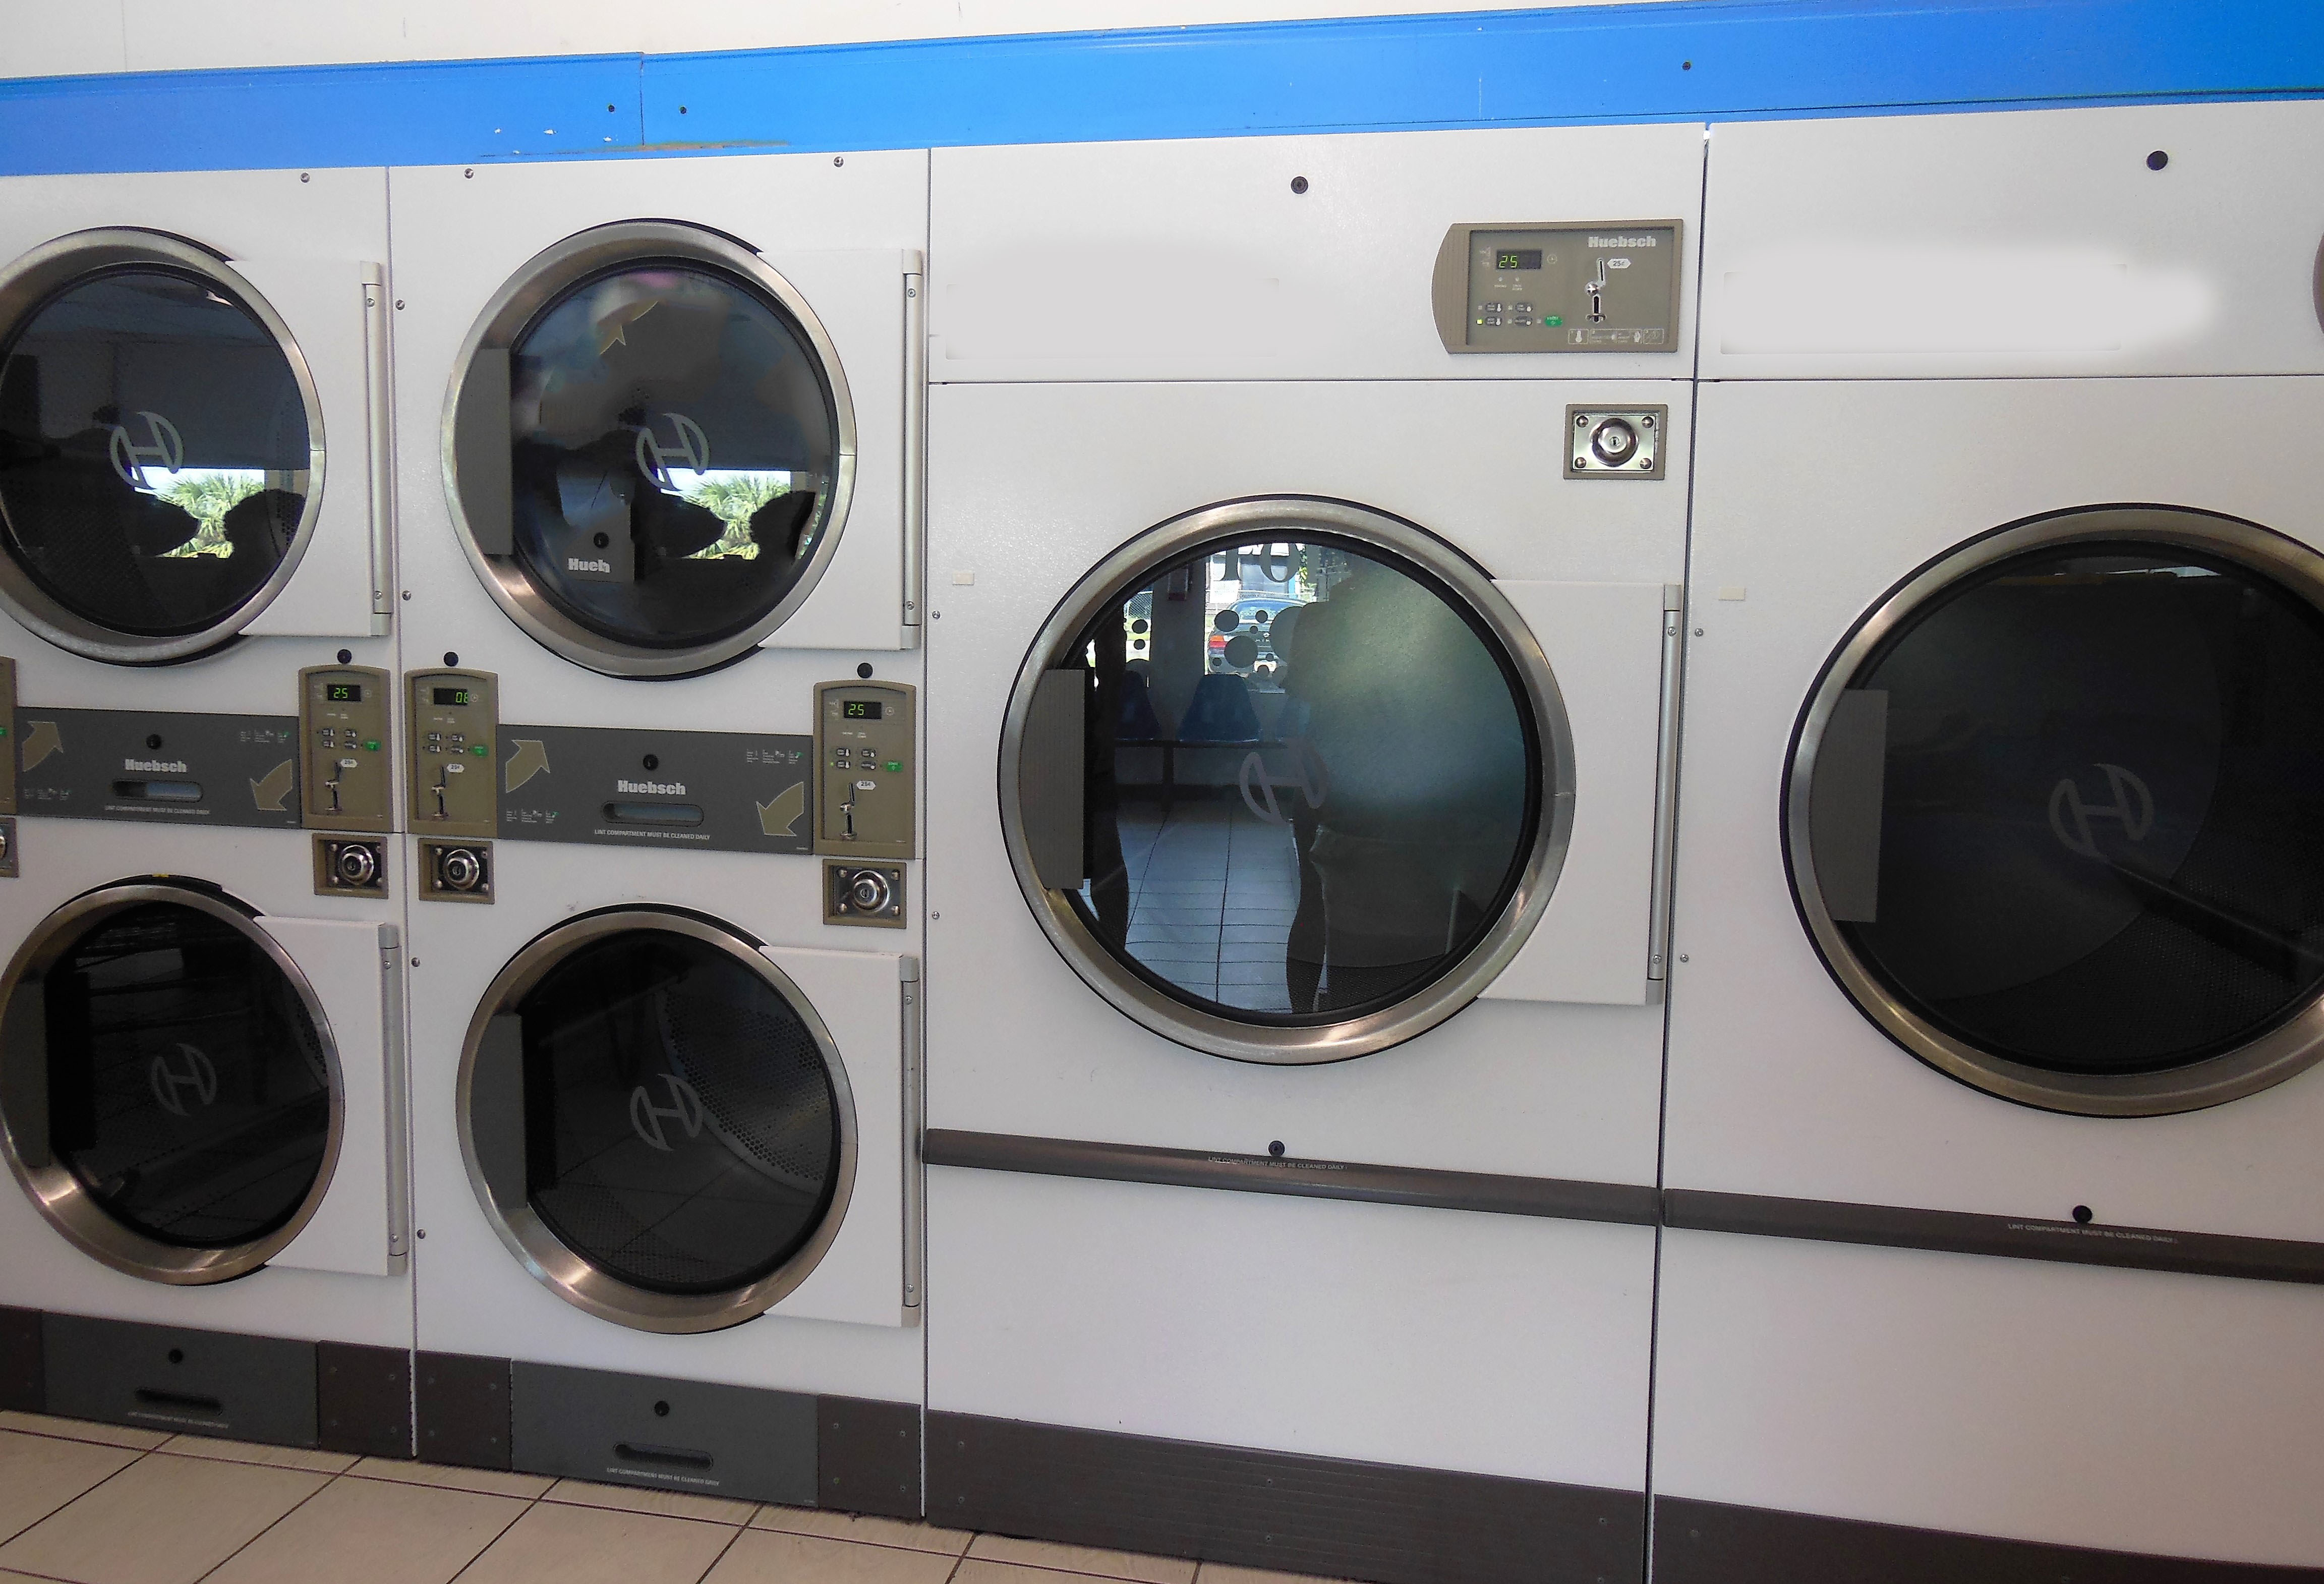 Palm River Square Laundromat image 0